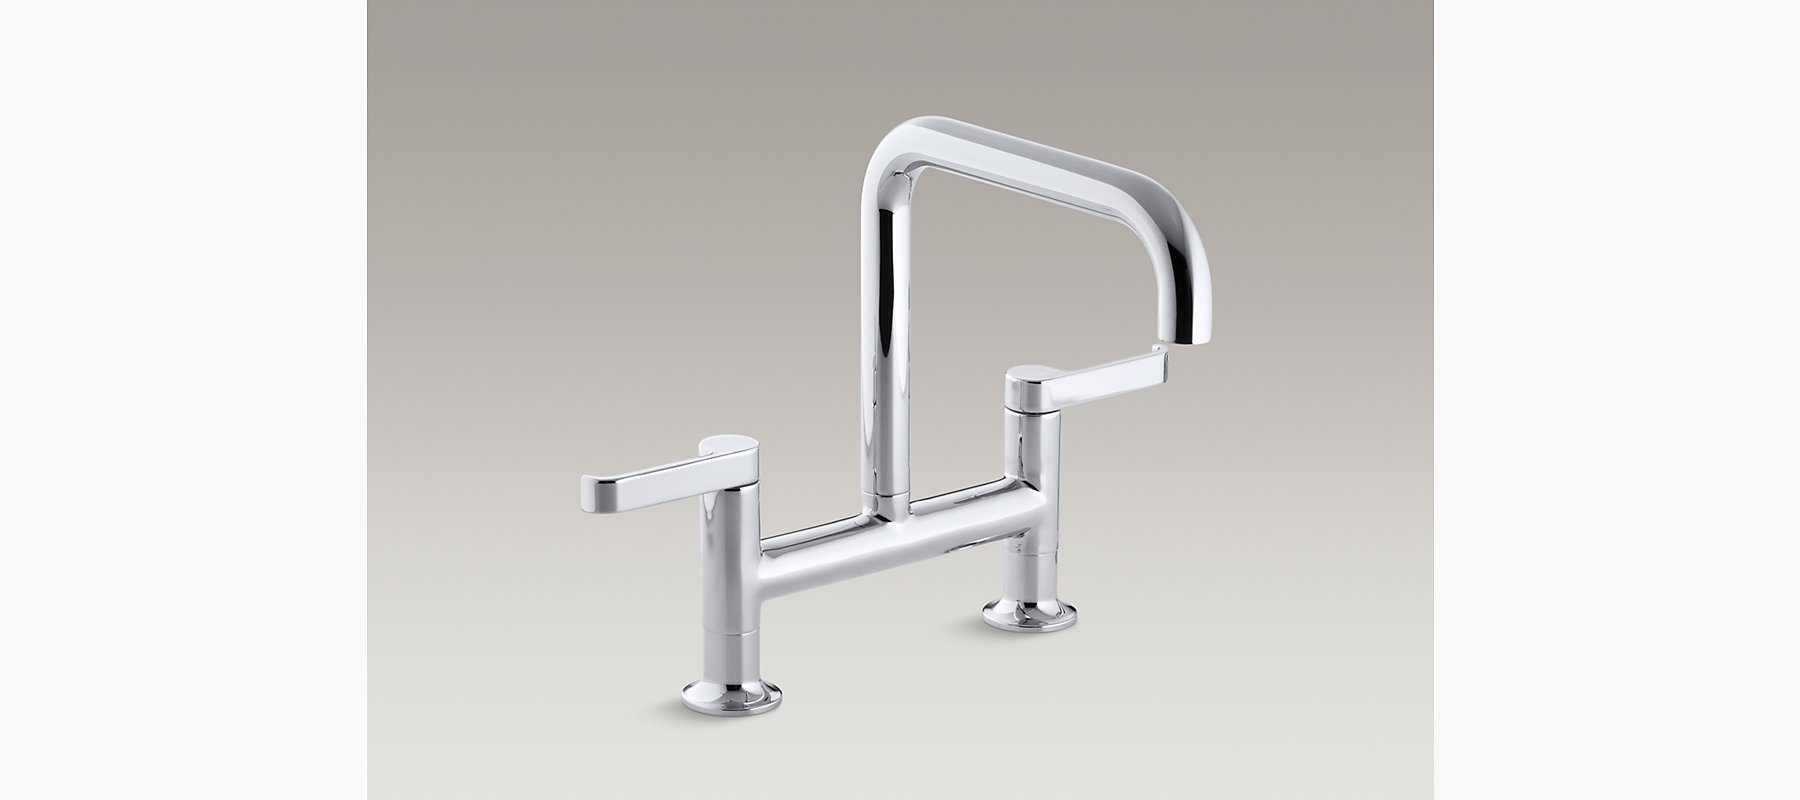 Torq Deck Mount Bridge Kitchen Faucet K 6125 4 Kohler